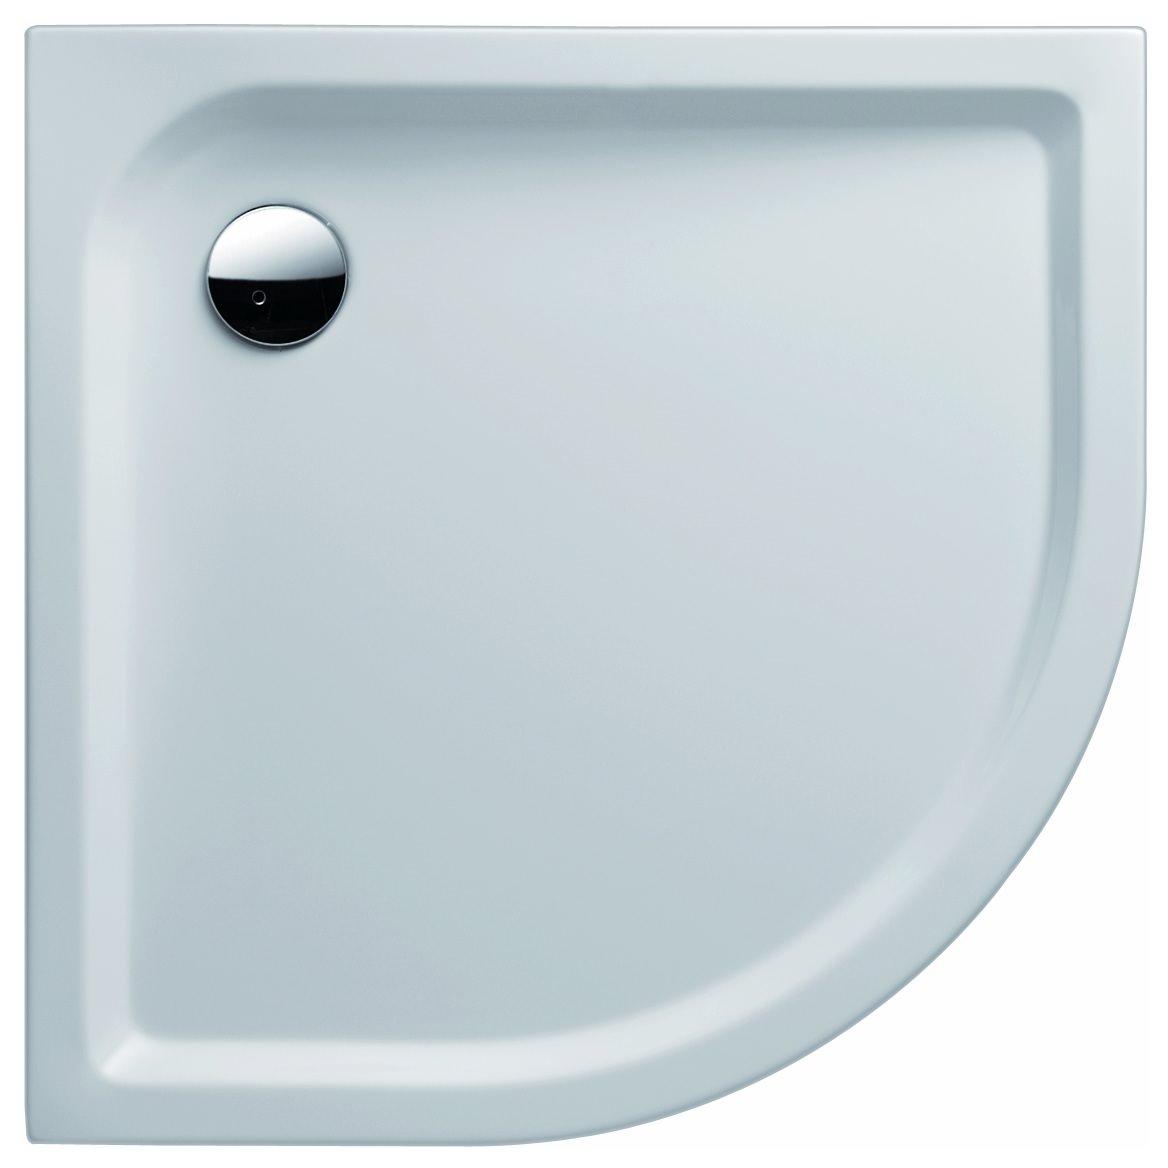 keramag icon rundduschwanne 900mm x 900mm wei alpin. Black Bedroom Furniture Sets. Home Design Ideas